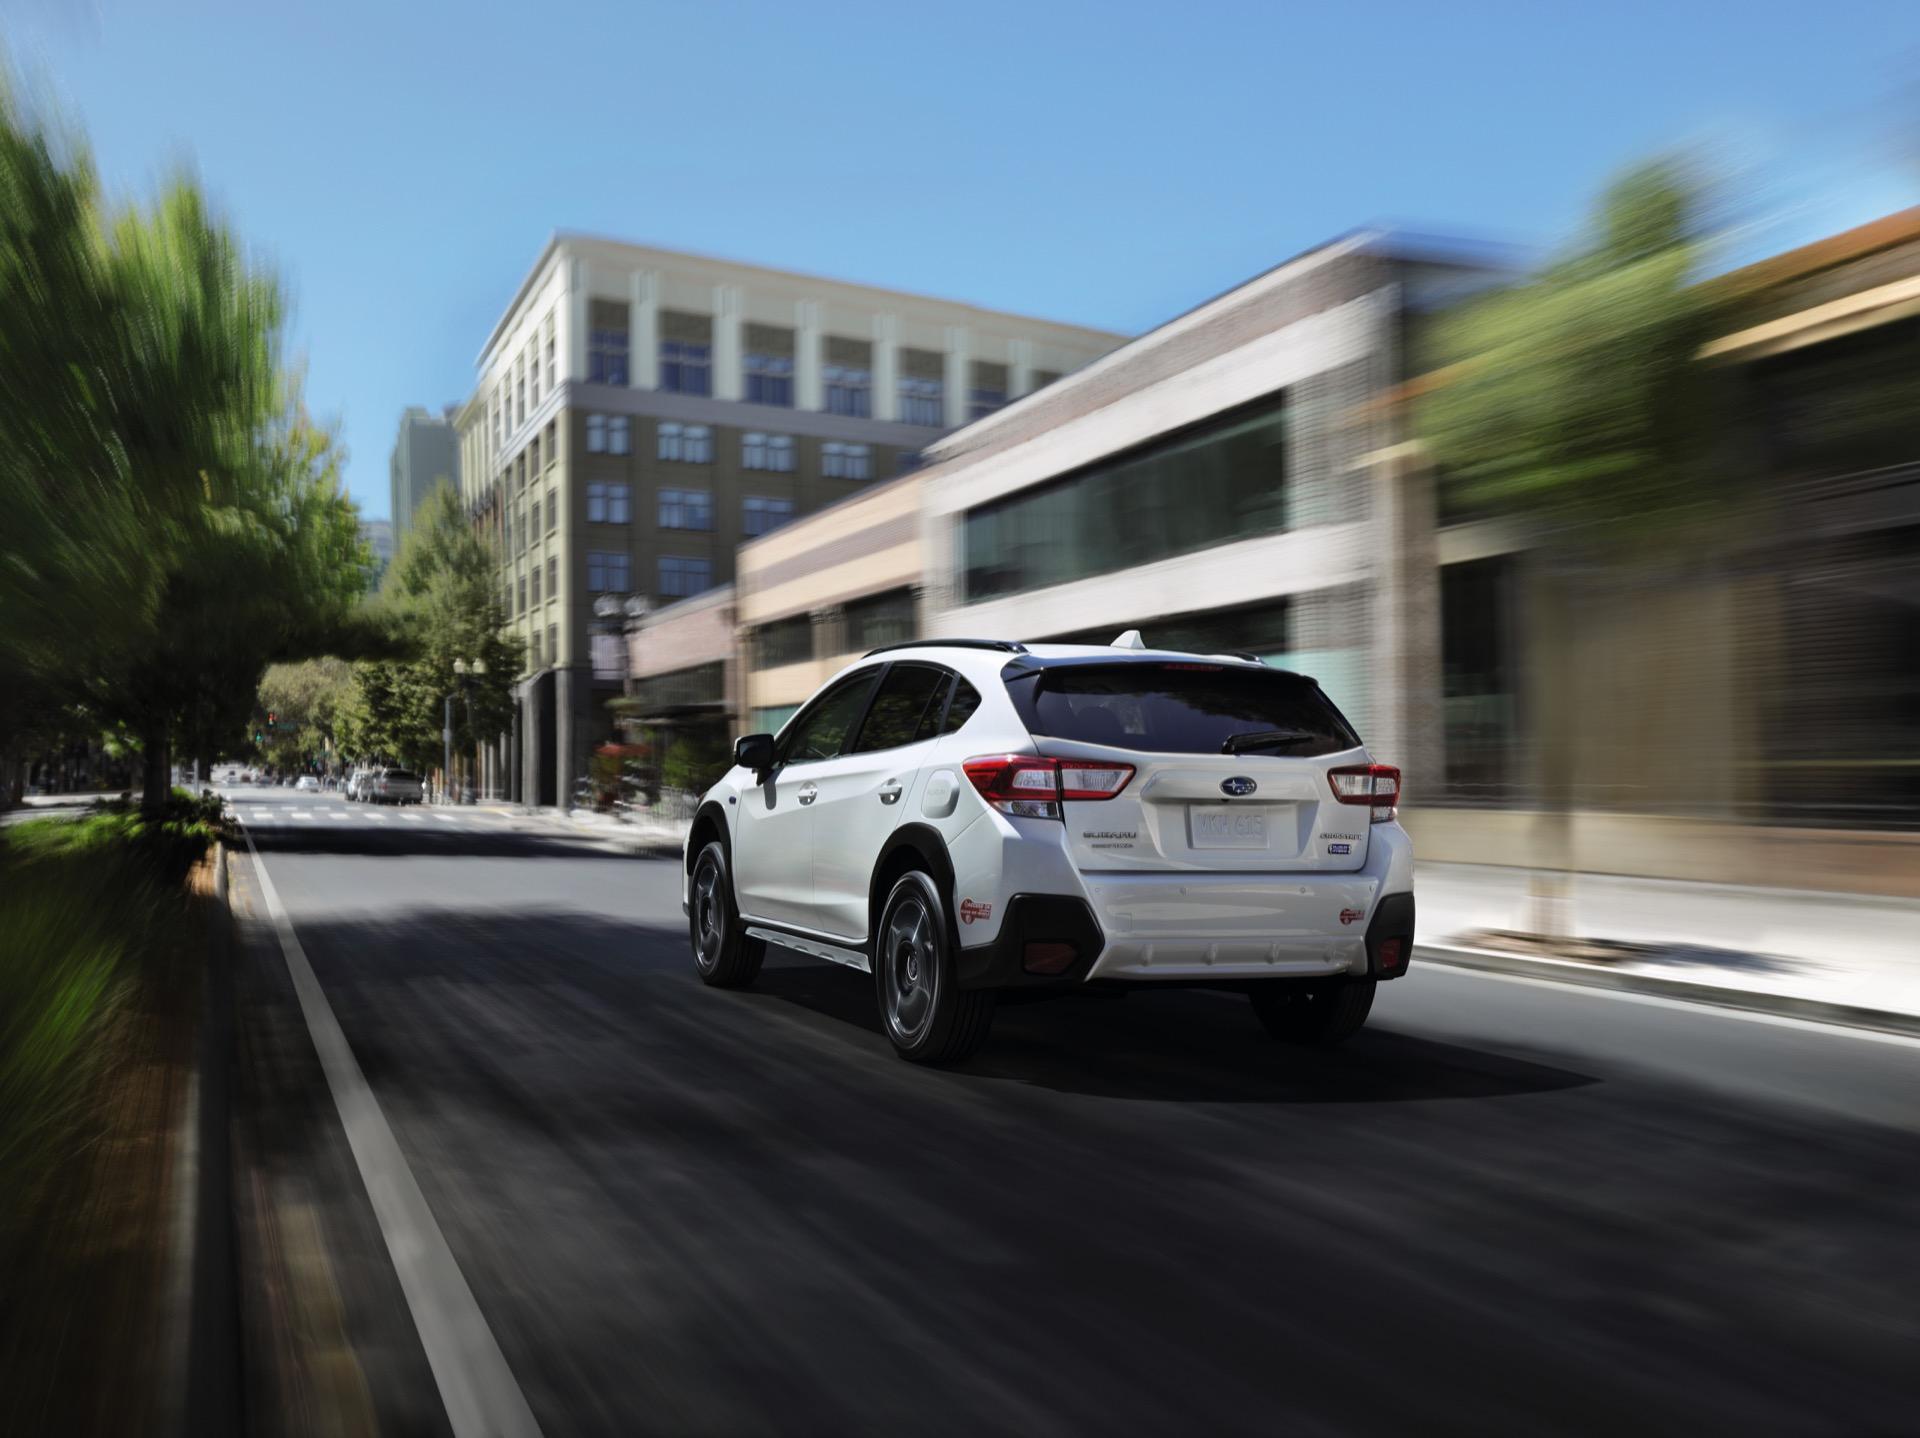 Highlander Hybrid mpg, E-Tron towing, EV emissions drop: Today's Car News